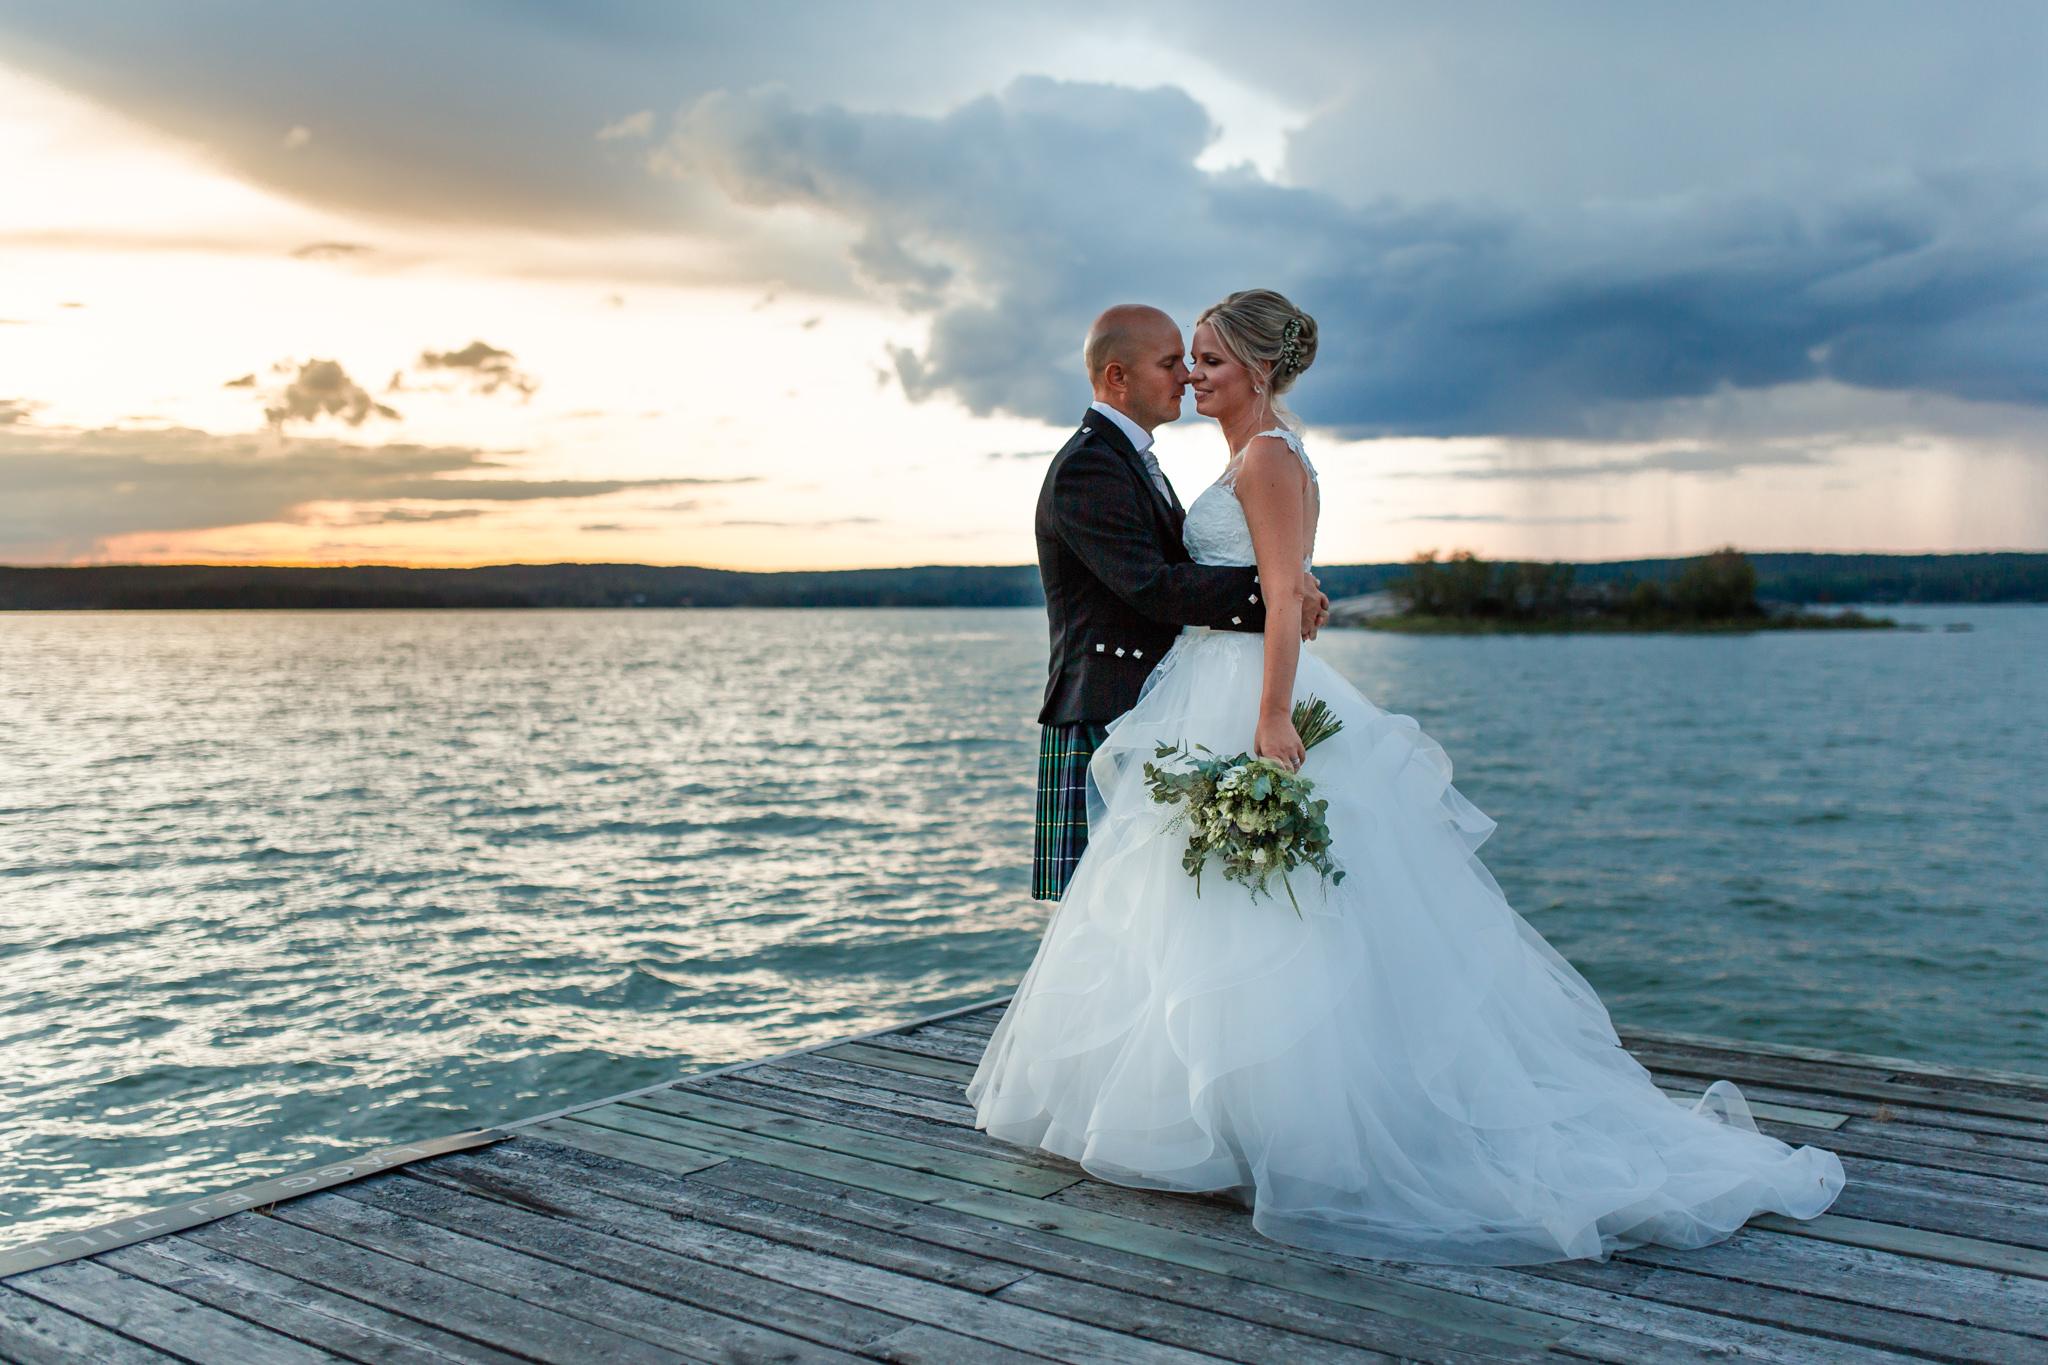 Scottish wedding at Mauritzberg Castle at Vikbolandet